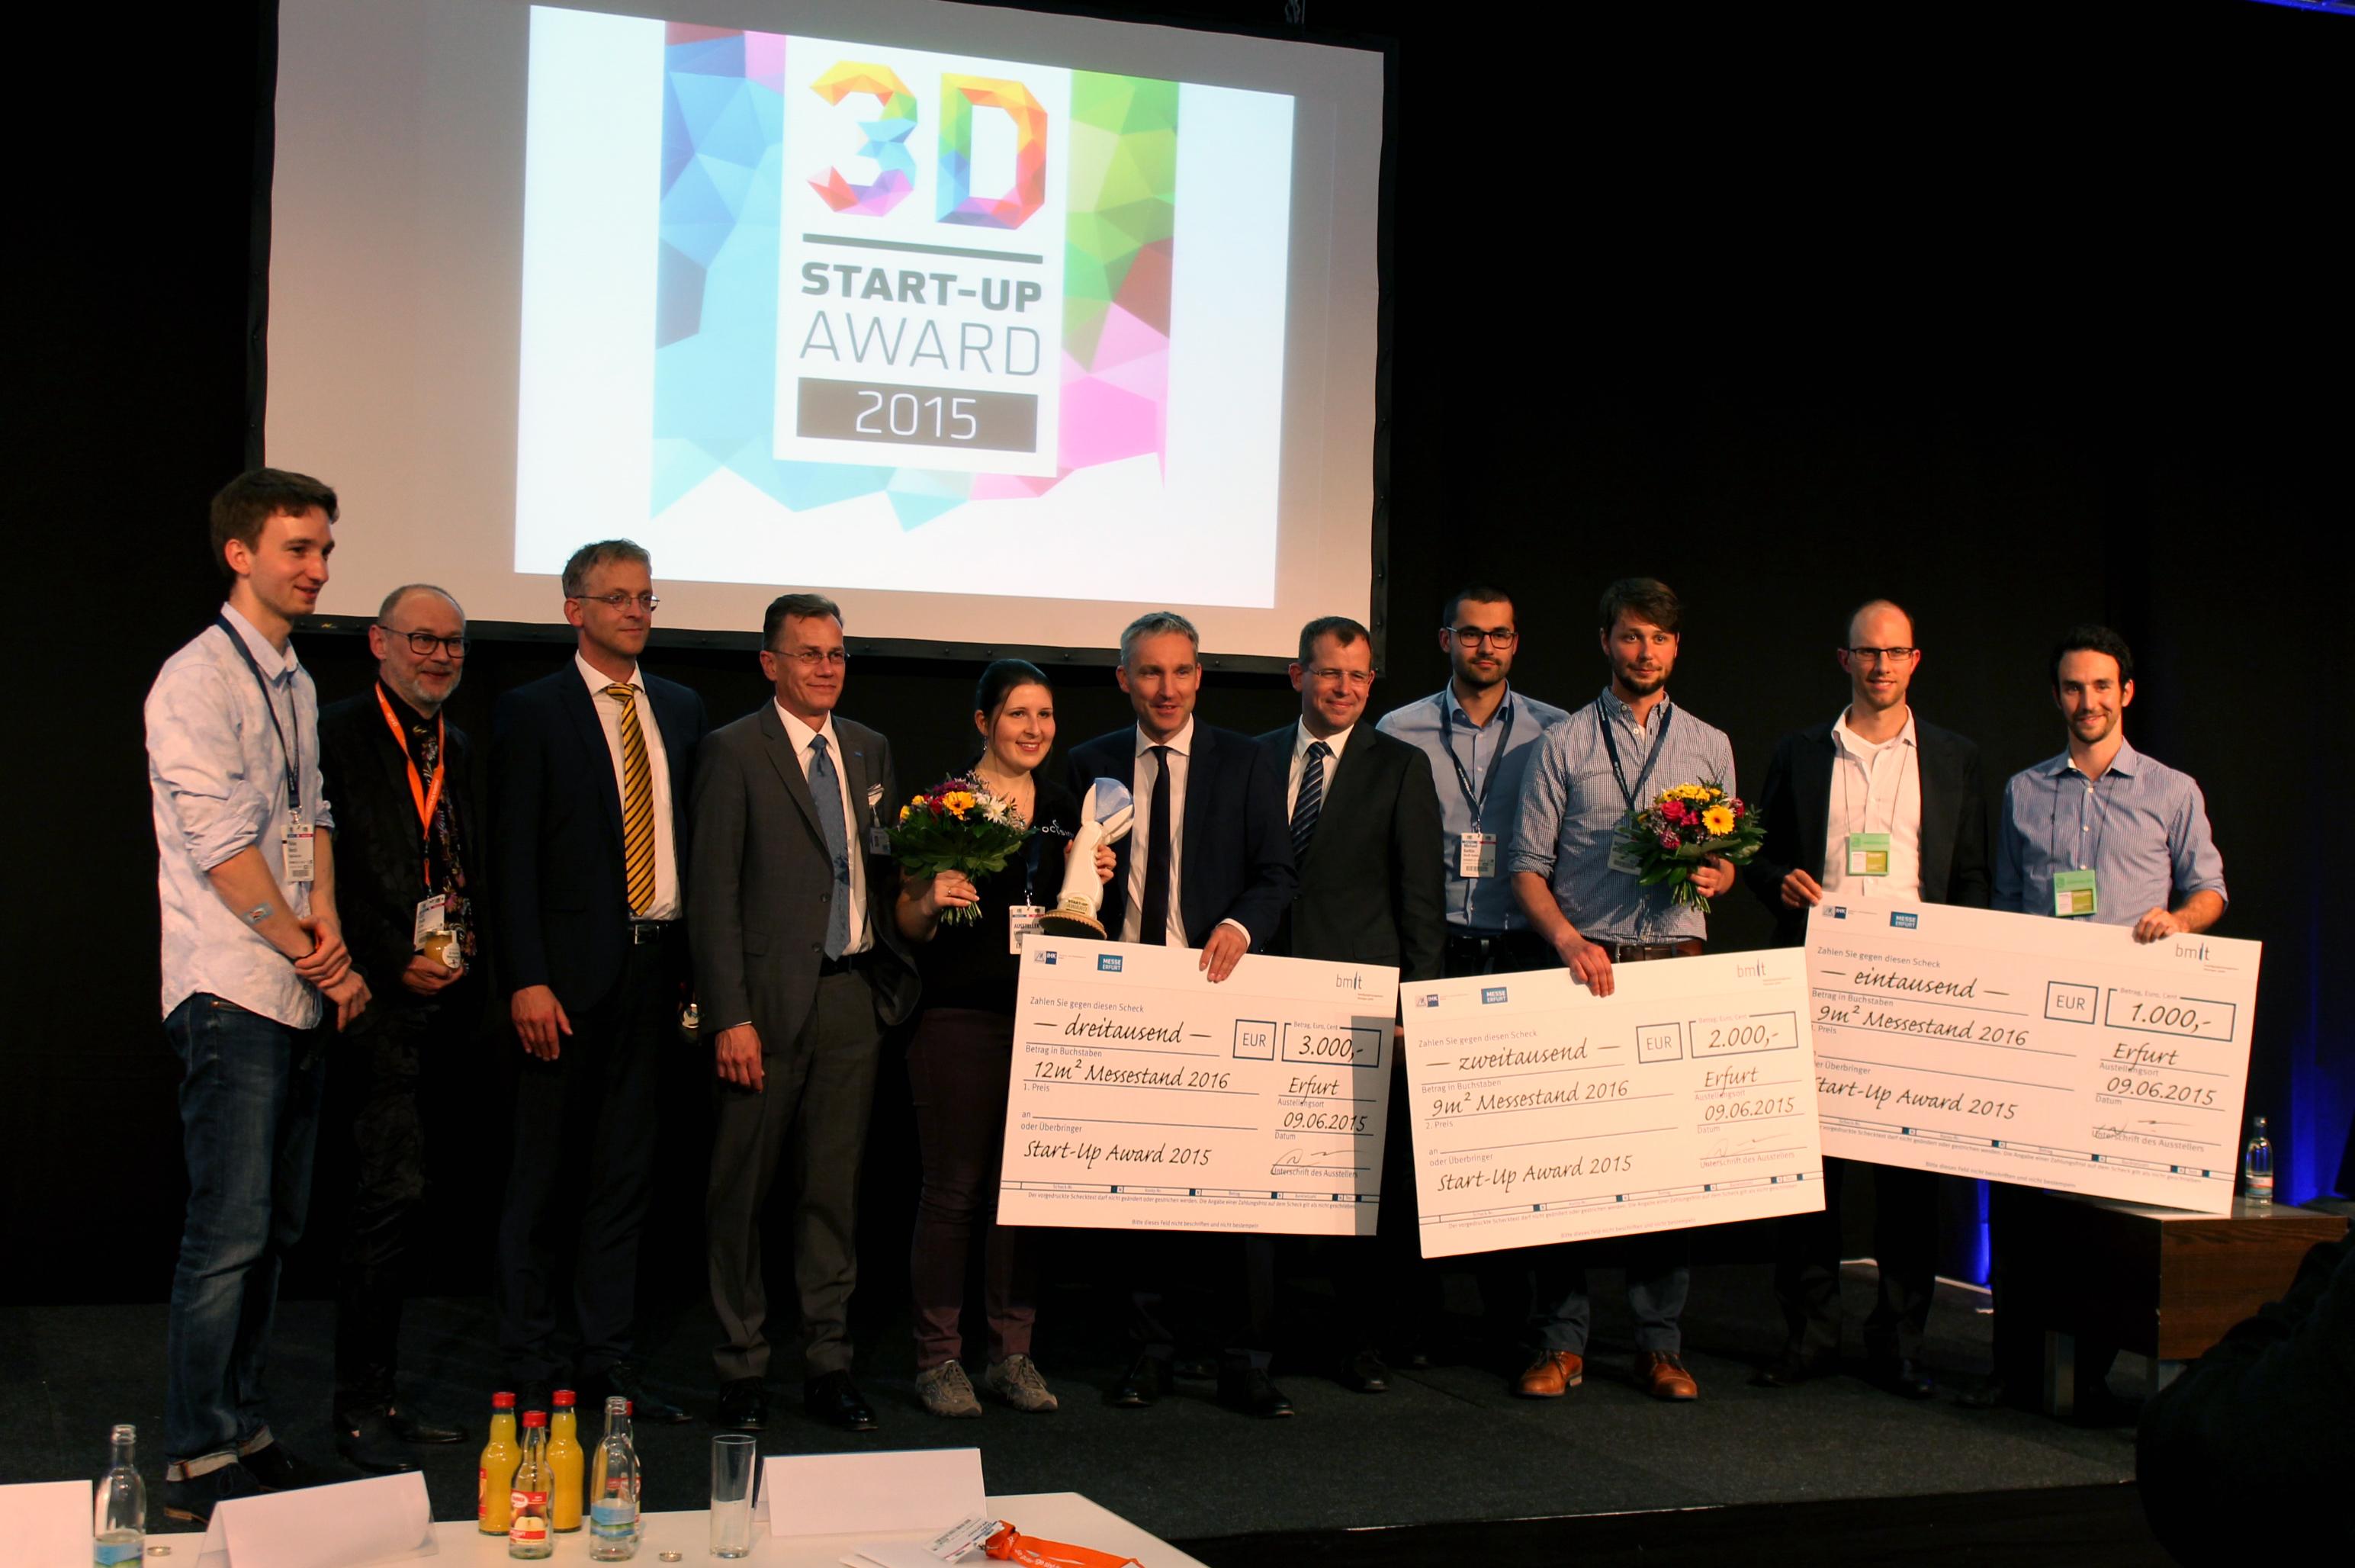 Start-up Award